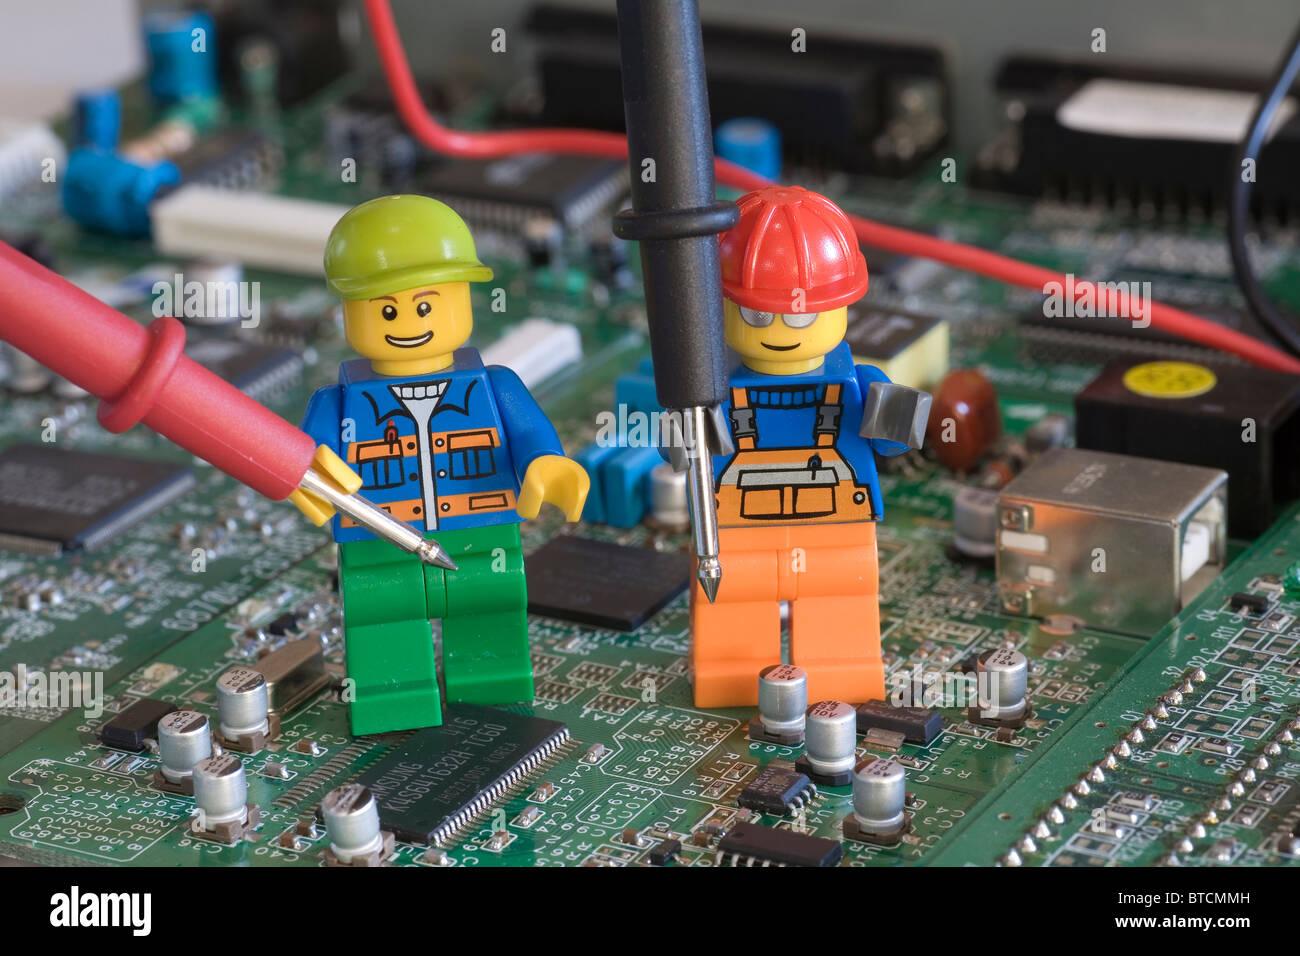 lego engineers on an electronic circuit board with testing probeslego engineers on an electronic circuit board with testing probes